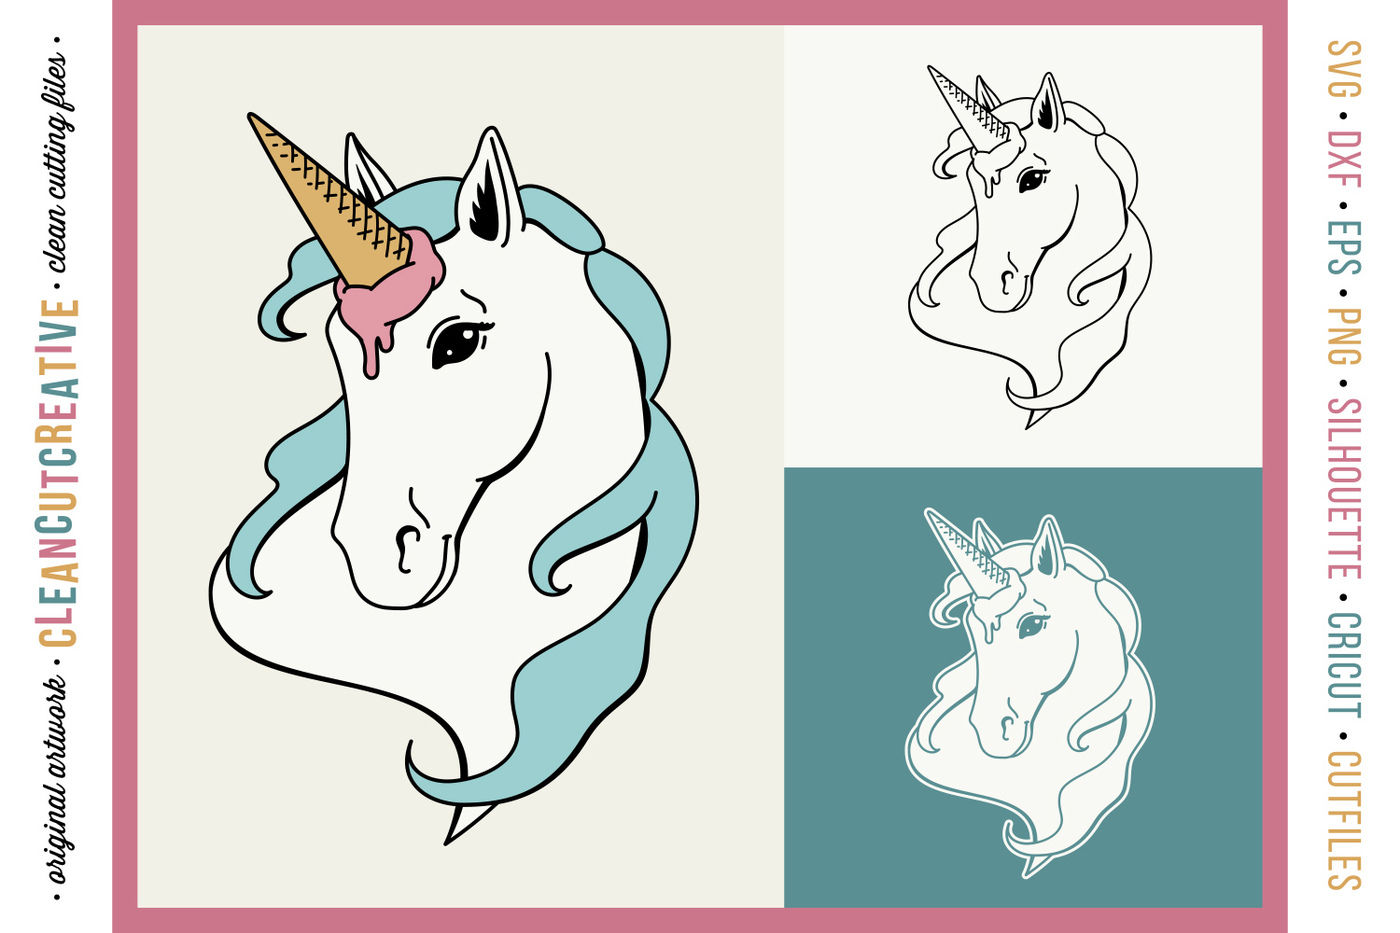 Funny Unicorn Ice Cream Horse Original Cut File Design Svg Dxf